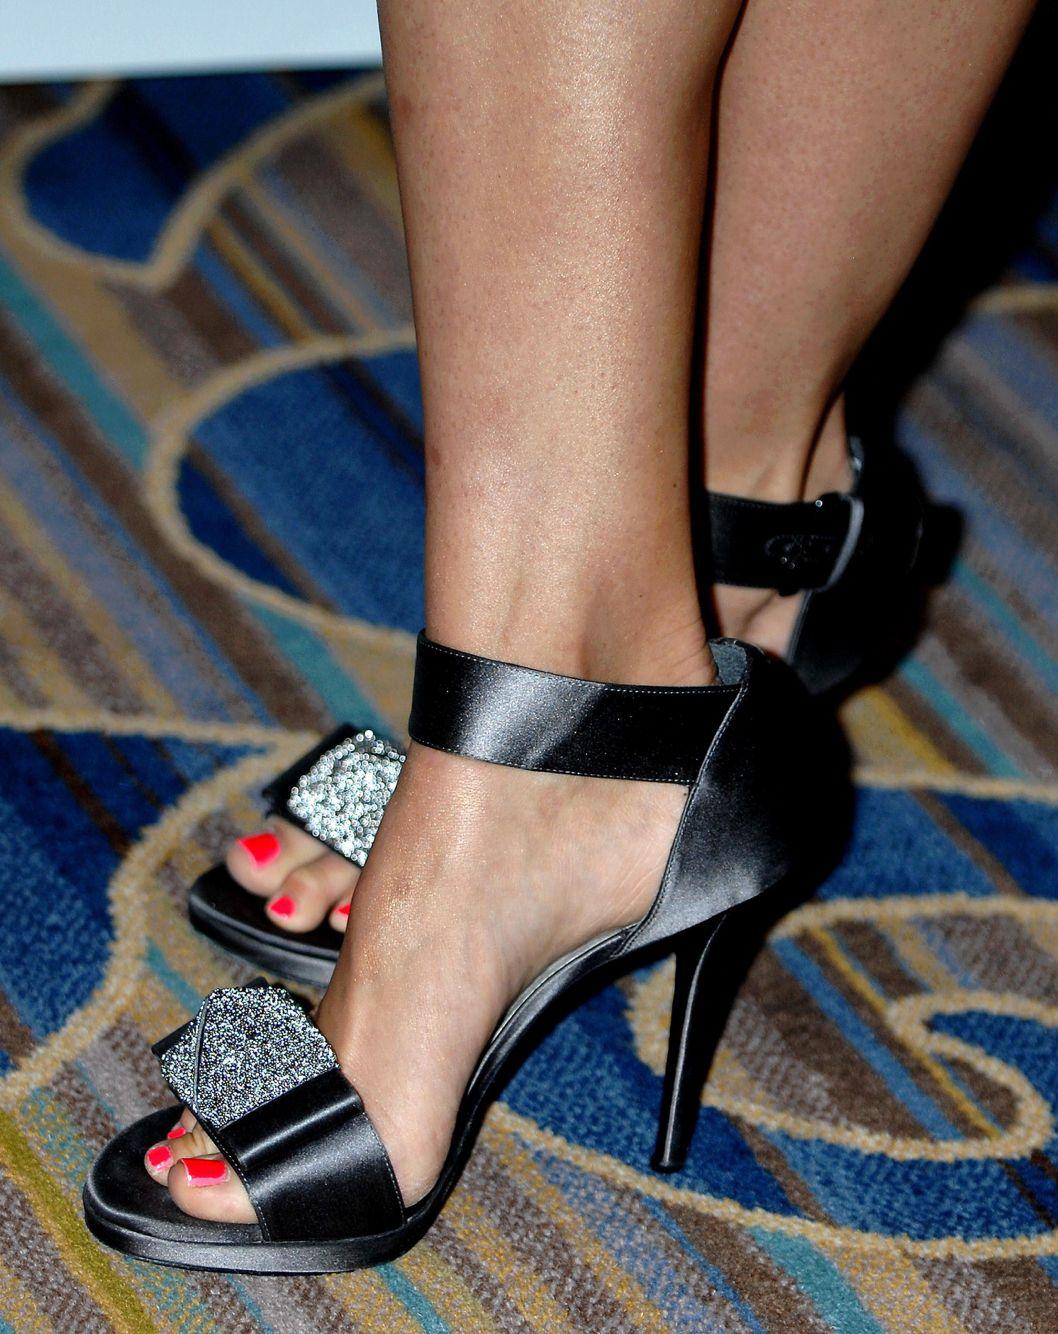 ab67b127b17 Abigail Spencer s High Heels ...XoXo